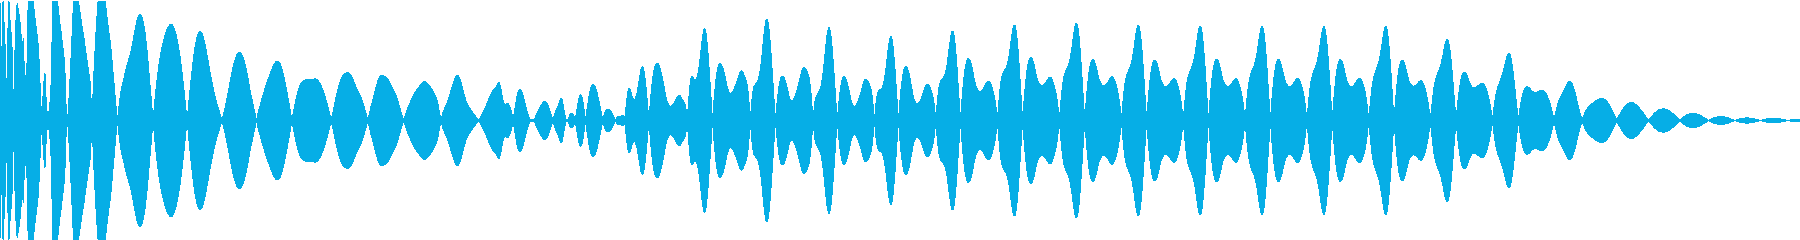 EDMキック キーAの再生済みの波形